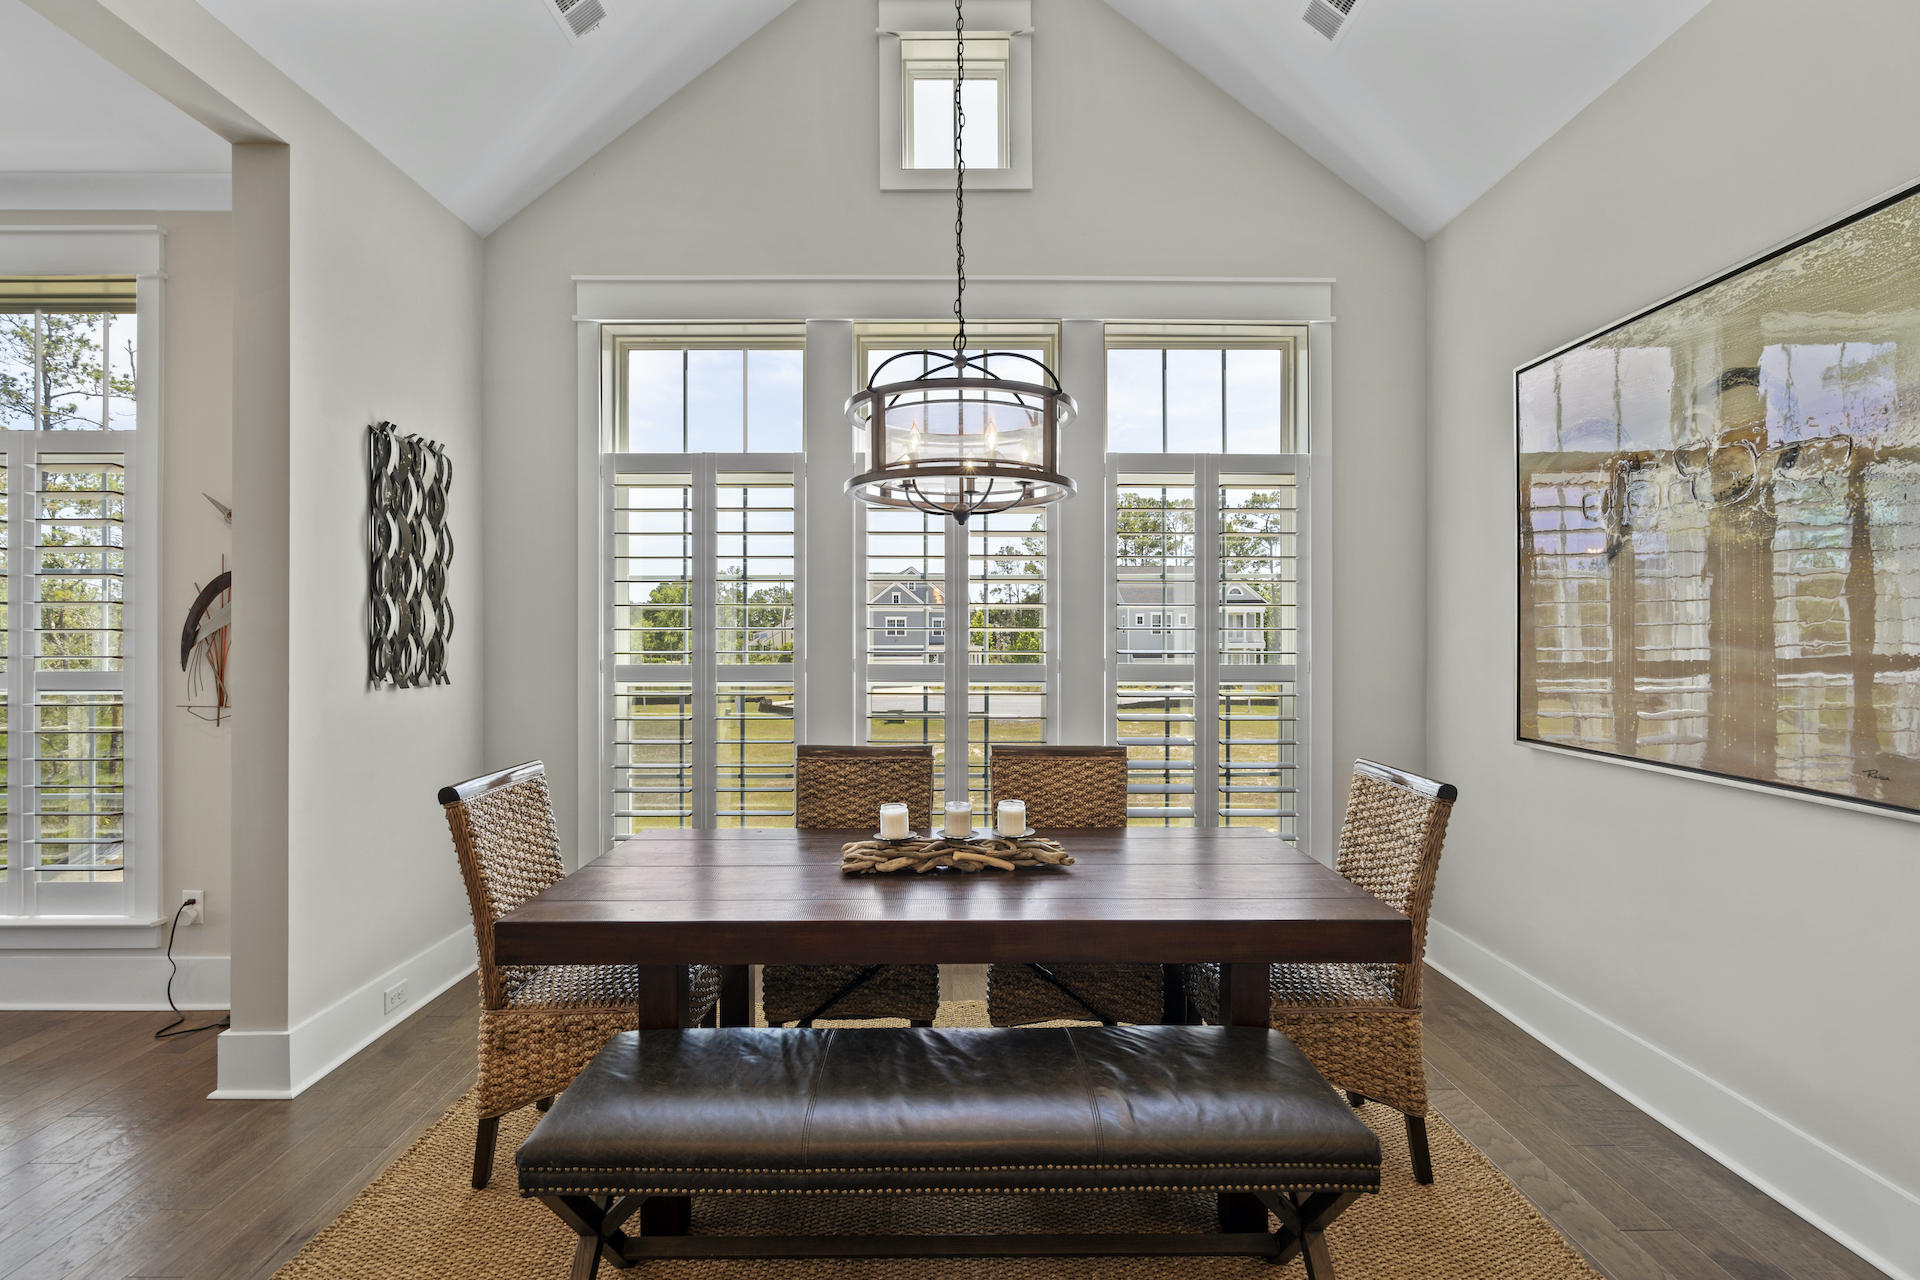 Dunes West Homes For Sale - 2316 Bucktail, Mount Pleasant, SC - 36